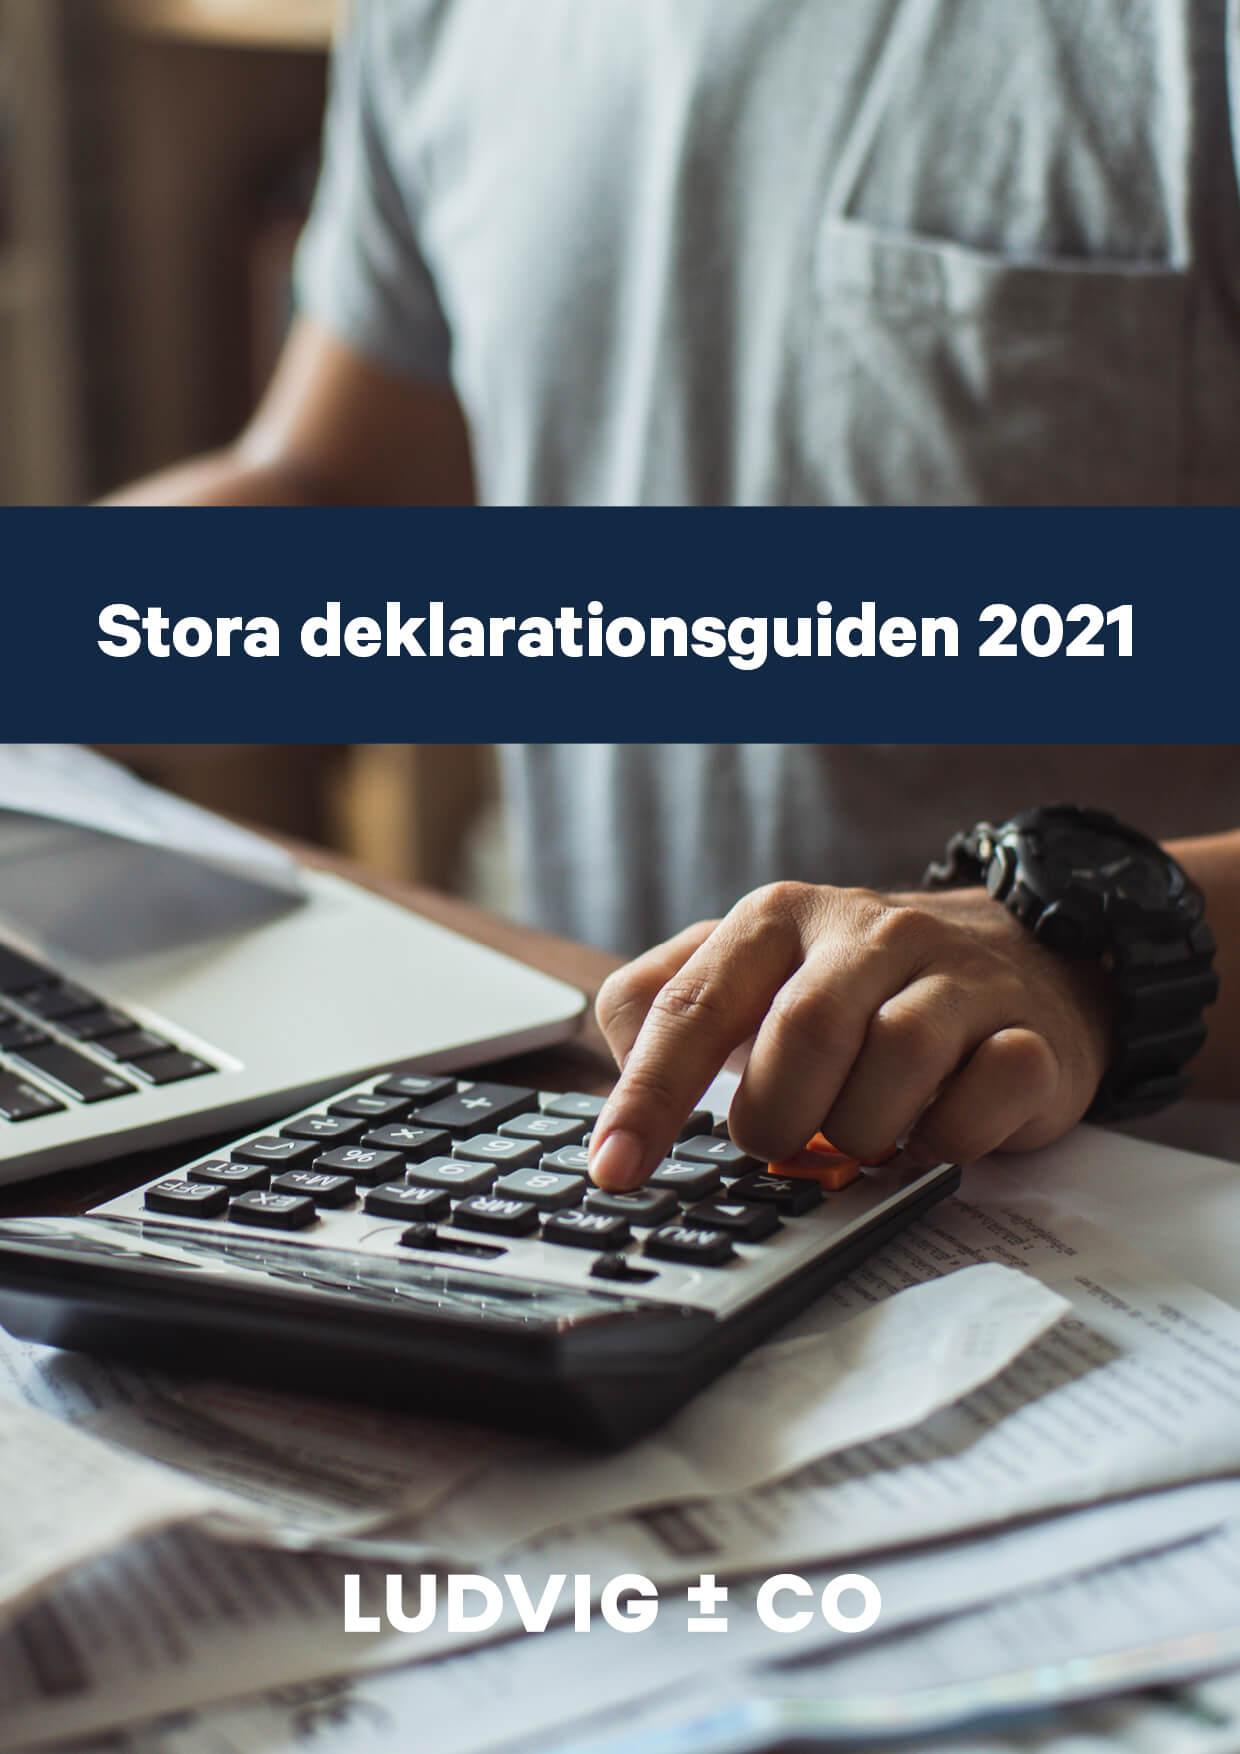 Stora-deklarationsguiden-2021